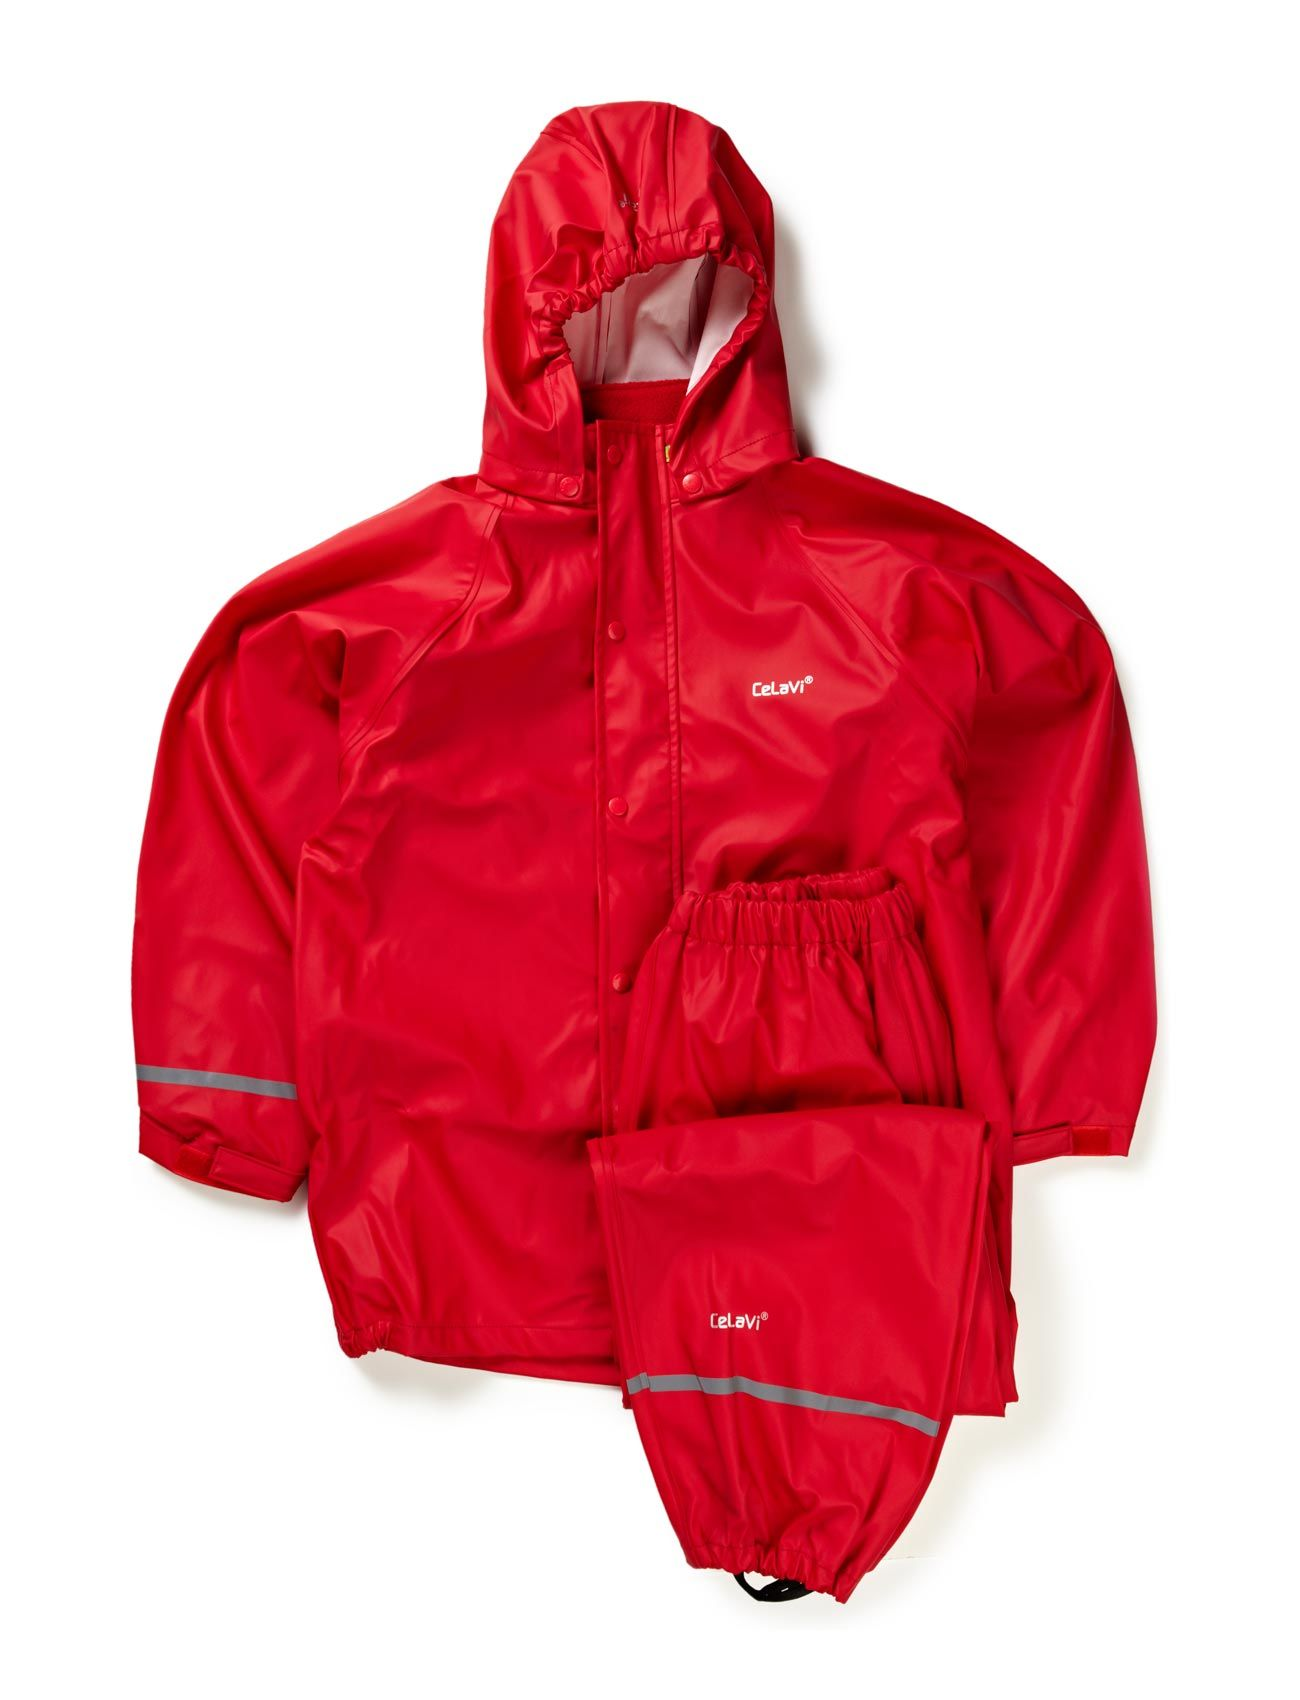 Basci Rainwear Set, Solid CeLaVi Regntøj til Børn i Rød